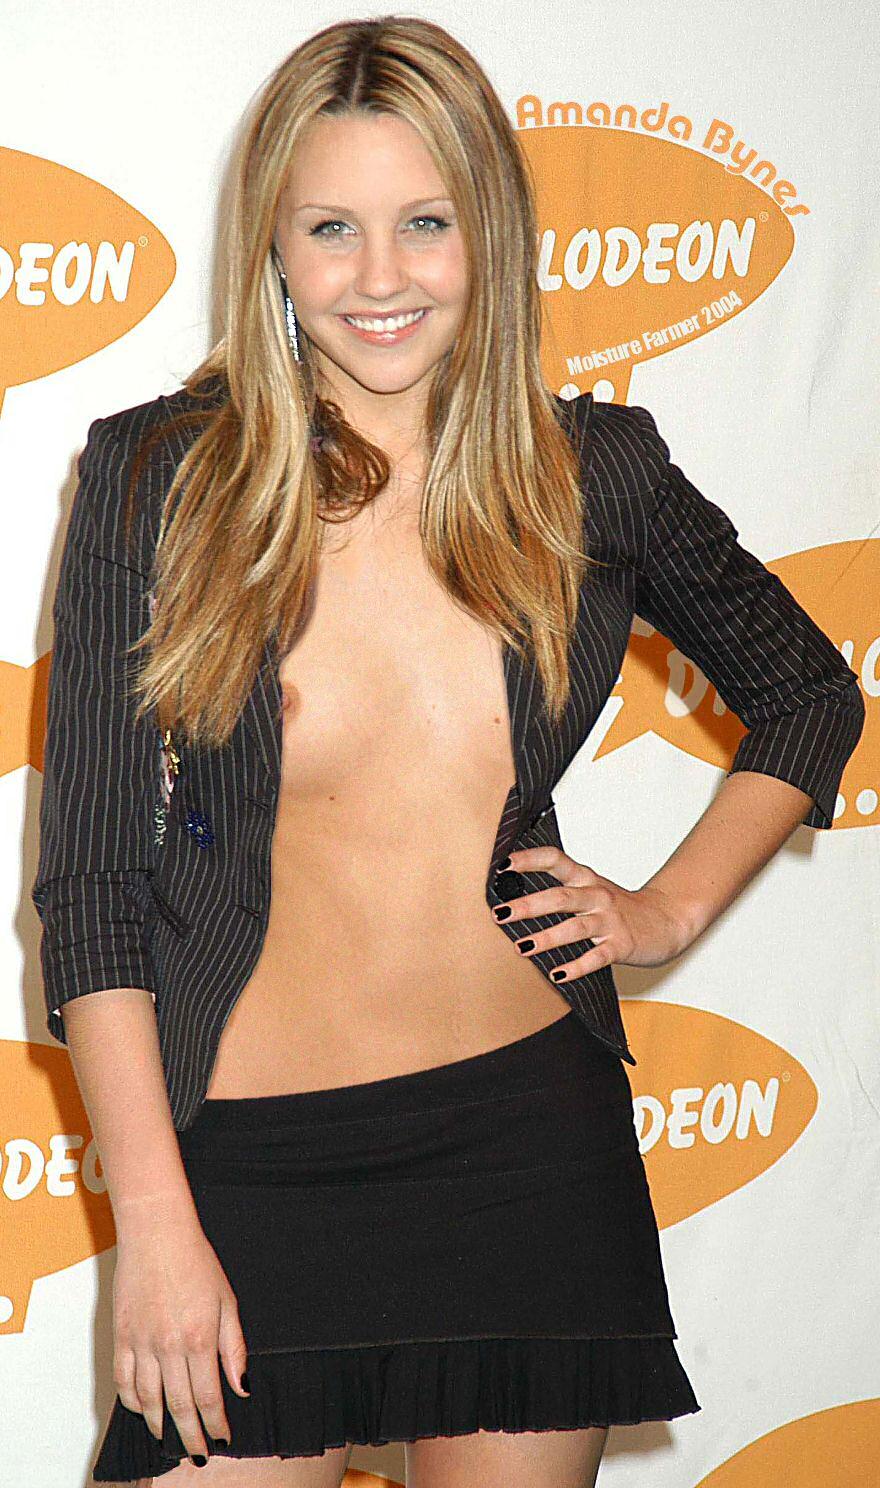 Amanda Bynes Nude Pics amanda bynes nude fake « celebrity fakes 4u